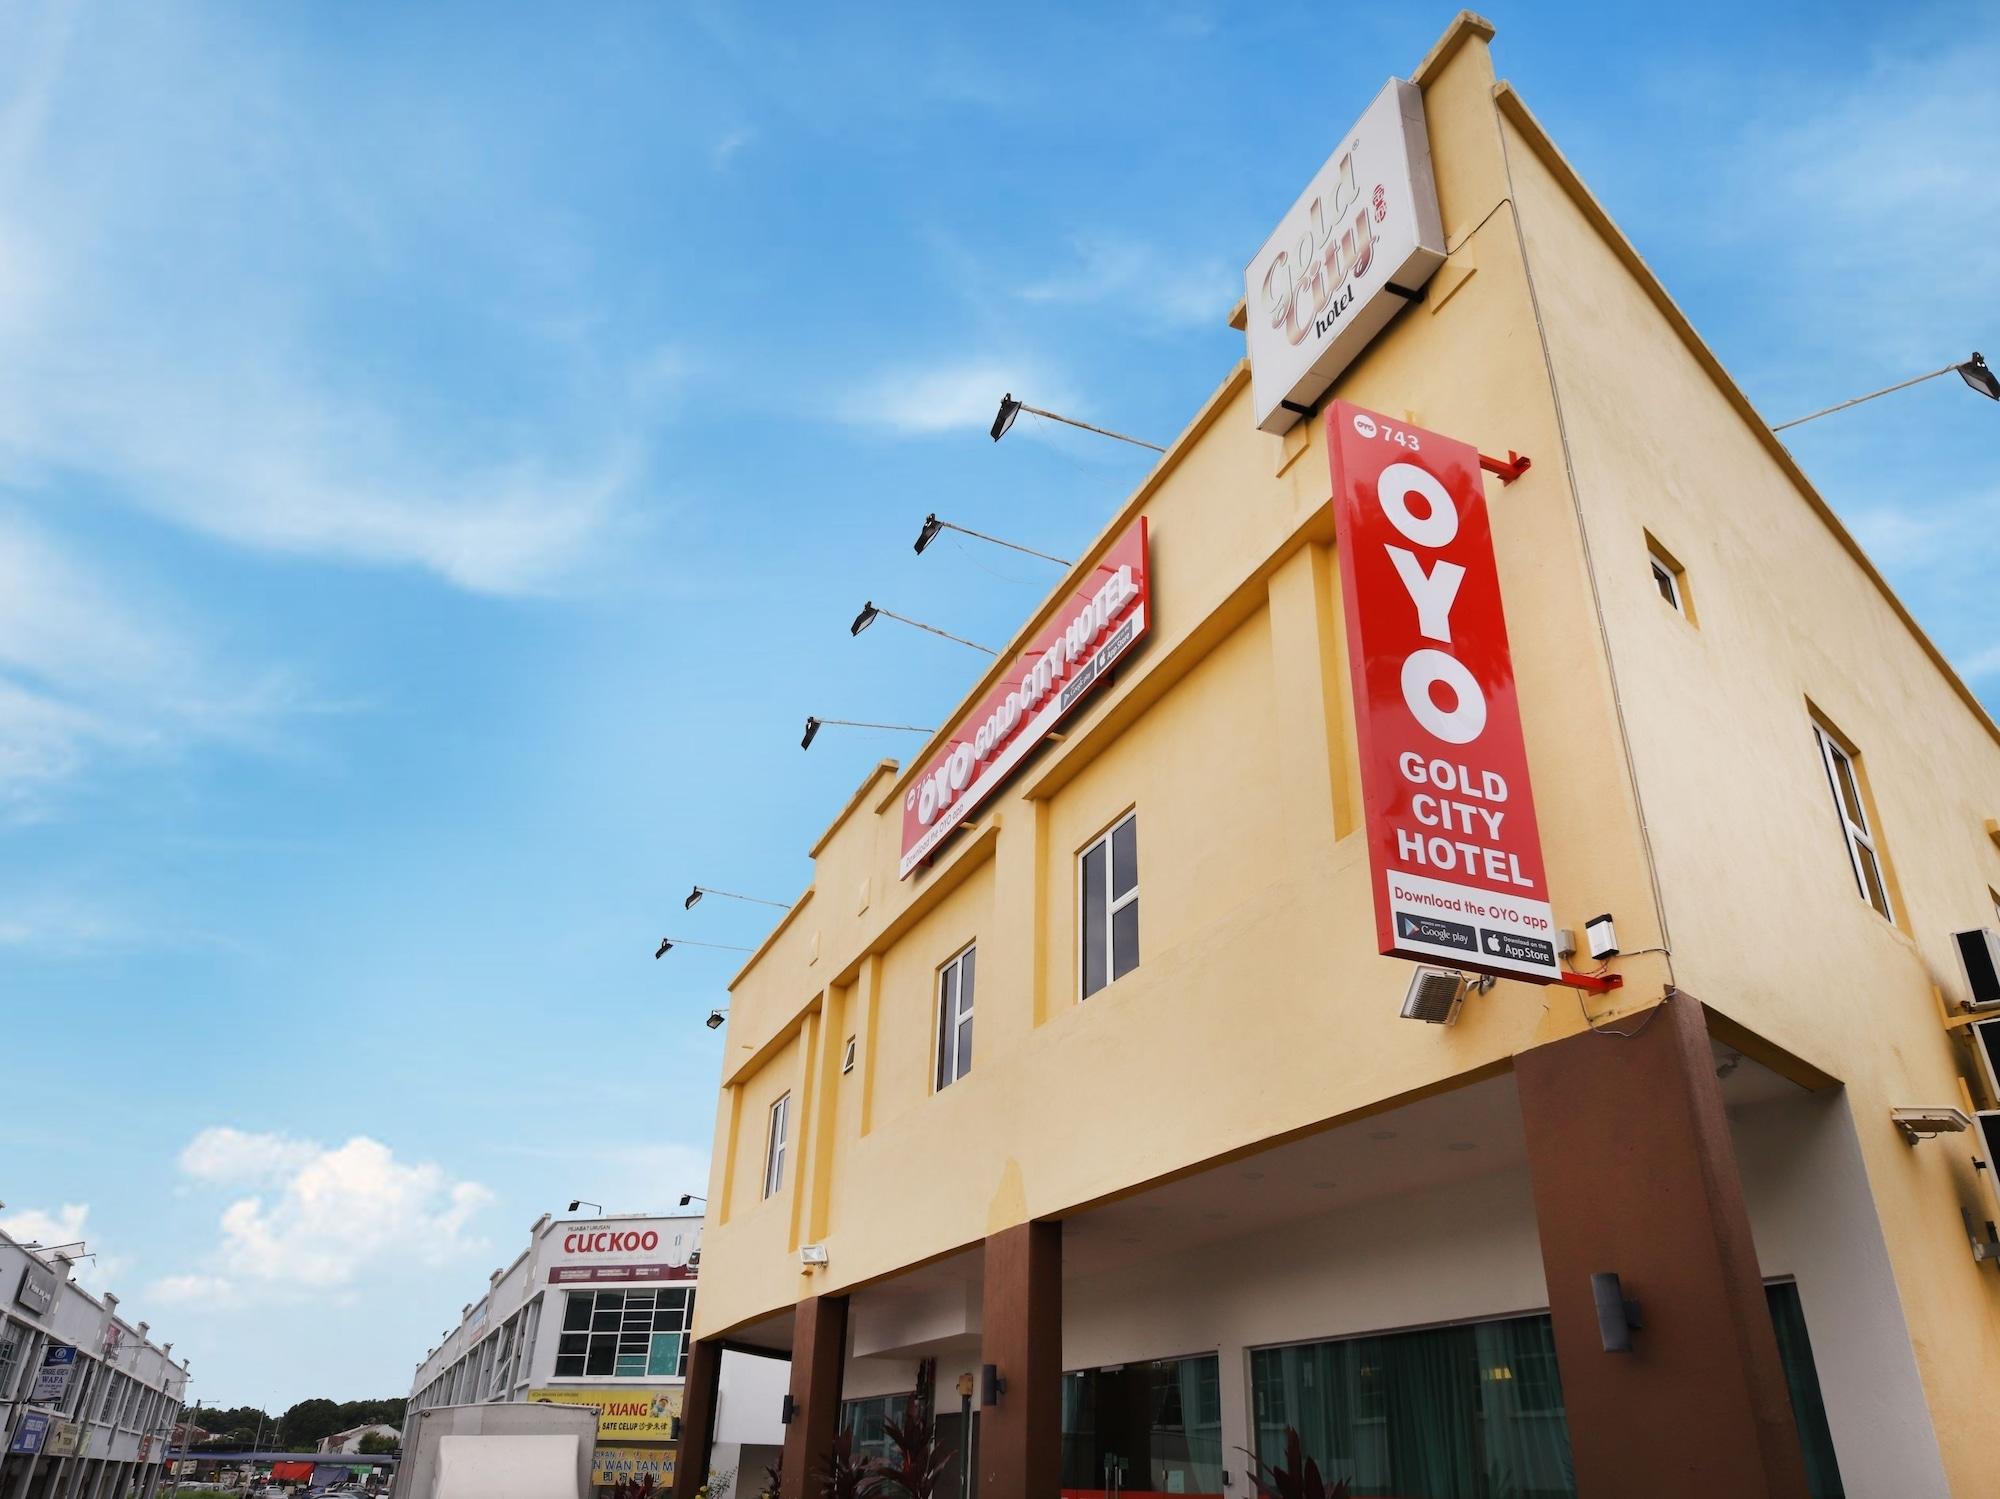 OYO 743 Gold City Hotel, Kota Melaka